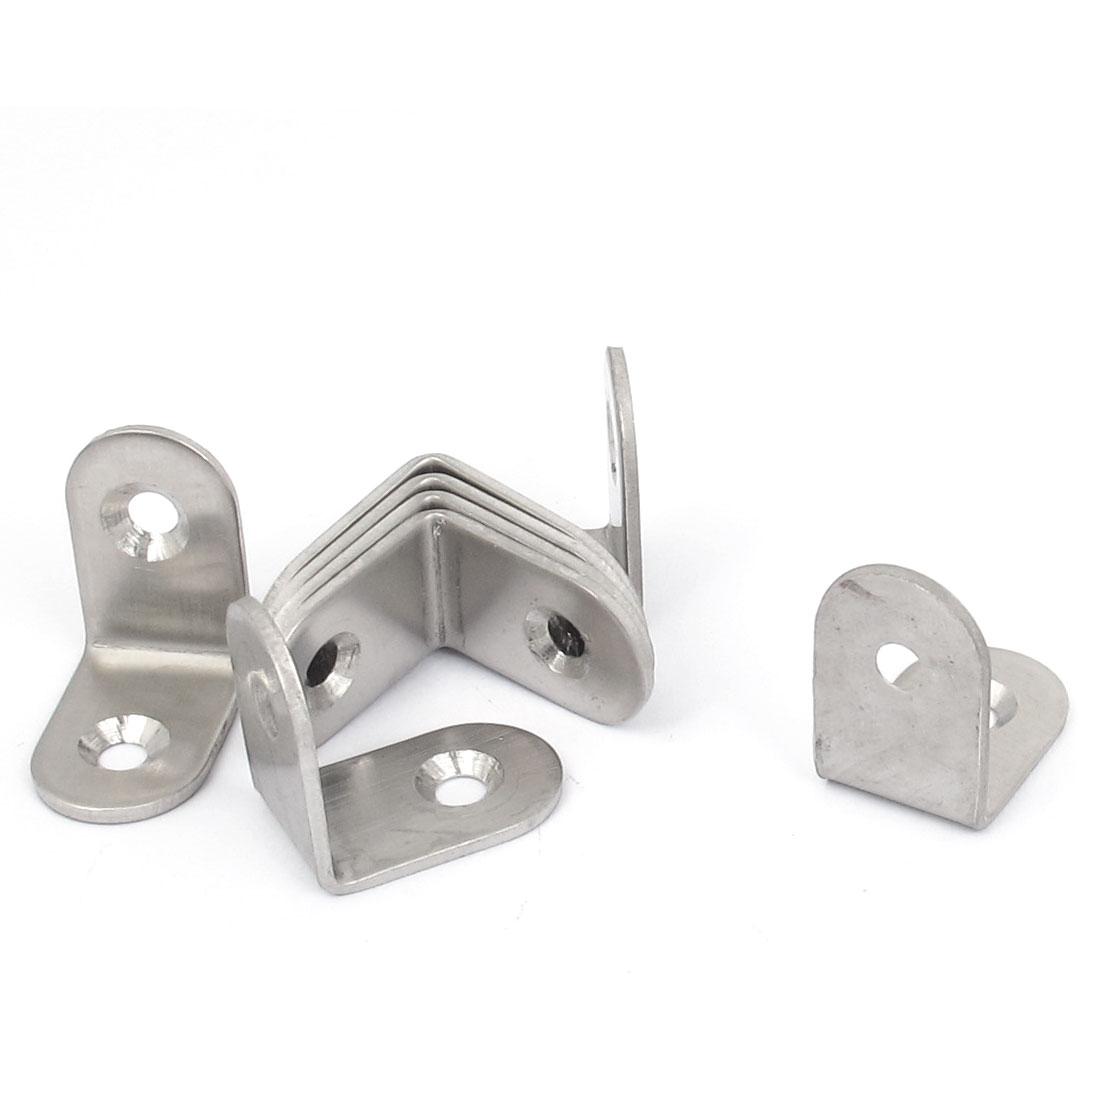 25mmx25mm L Shape 90 Degree Shelf Corner Brace Angle Bracket Support 9pcs